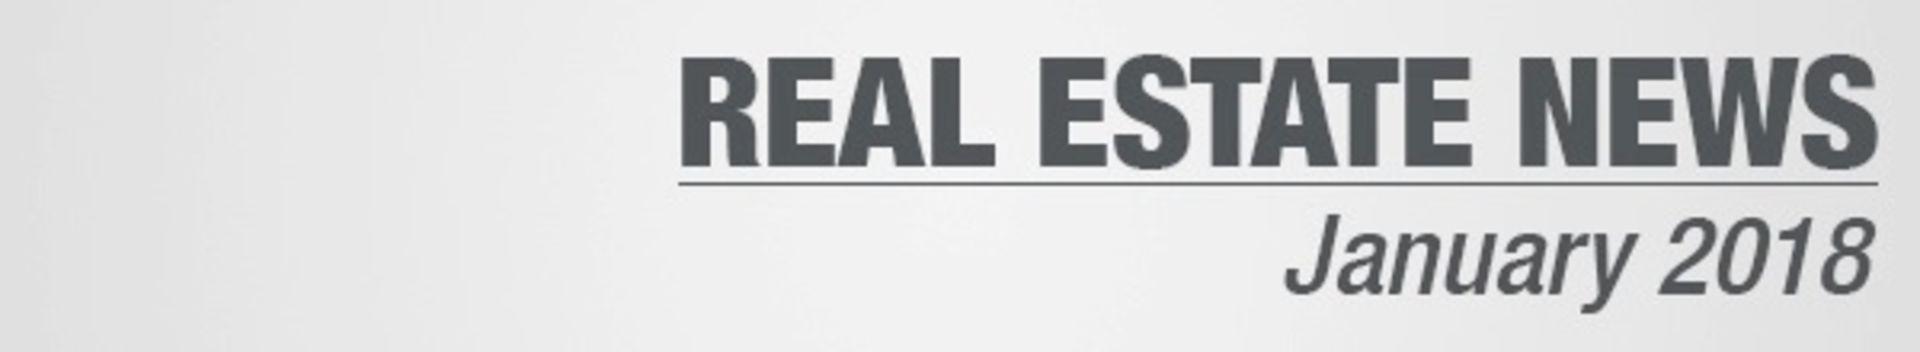 Real Estate News January 2018